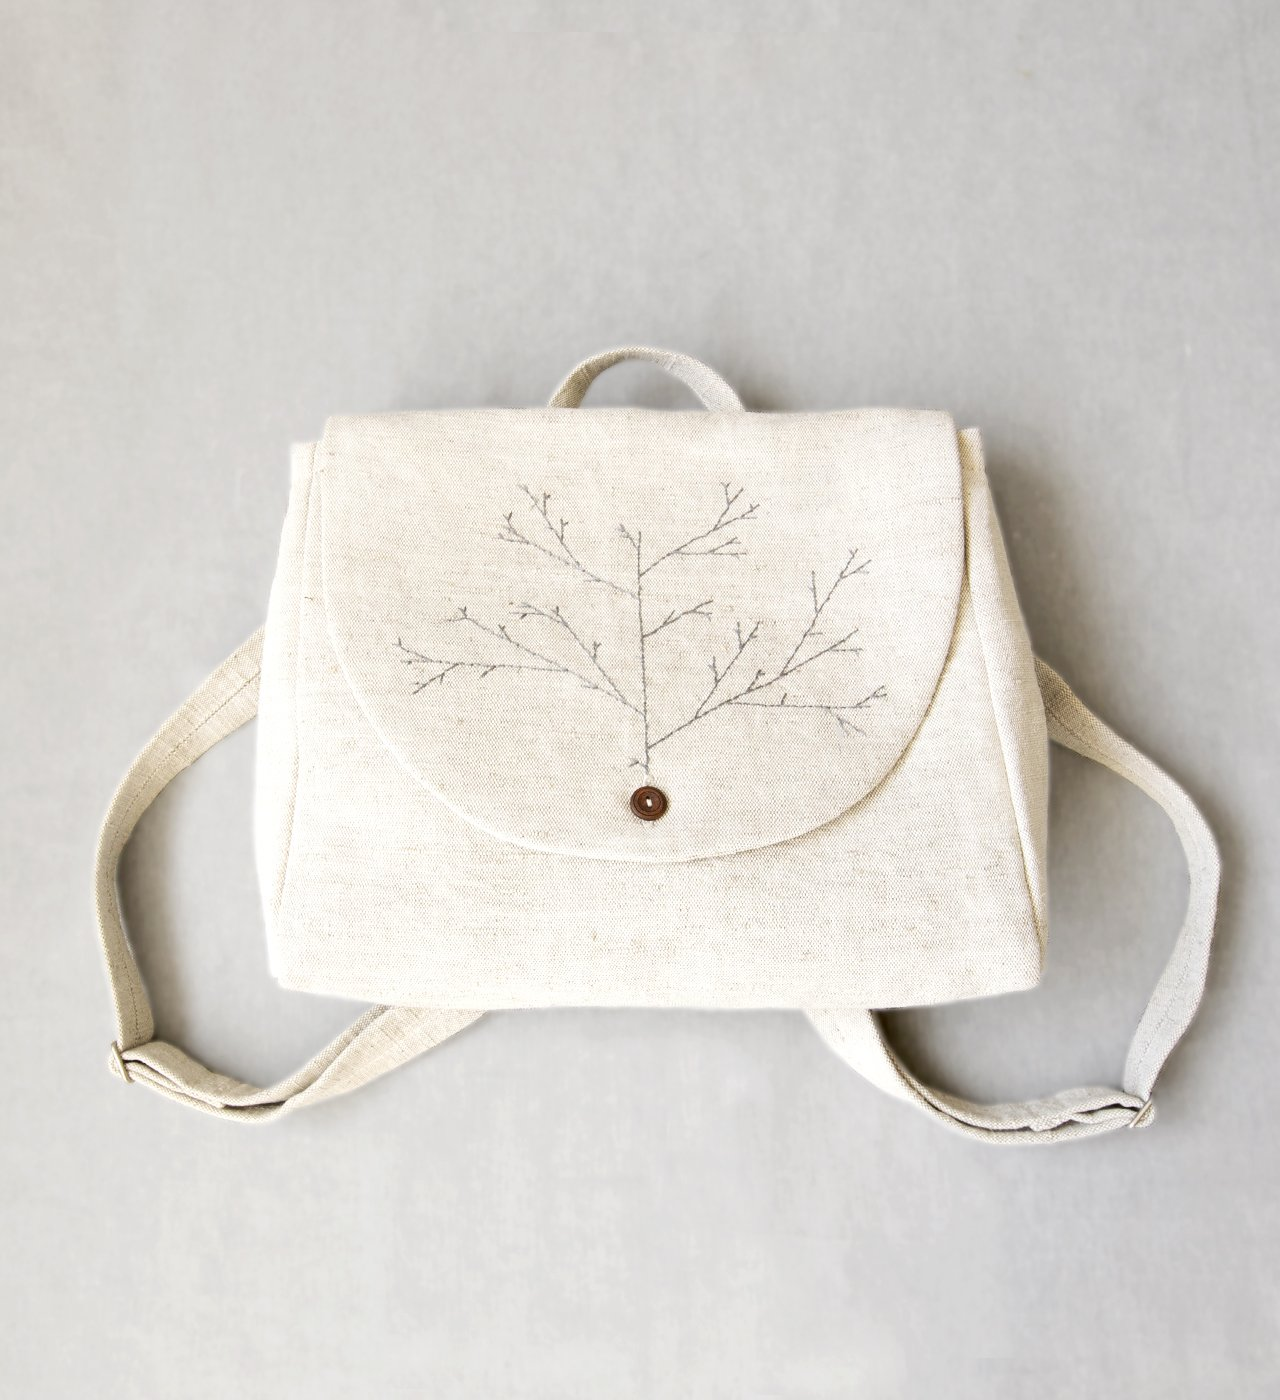 Embroidered backpack linen bag canvas women's backpack linen backpack hand embroidery white linen bag wedding linen bag rustic bag boho chic